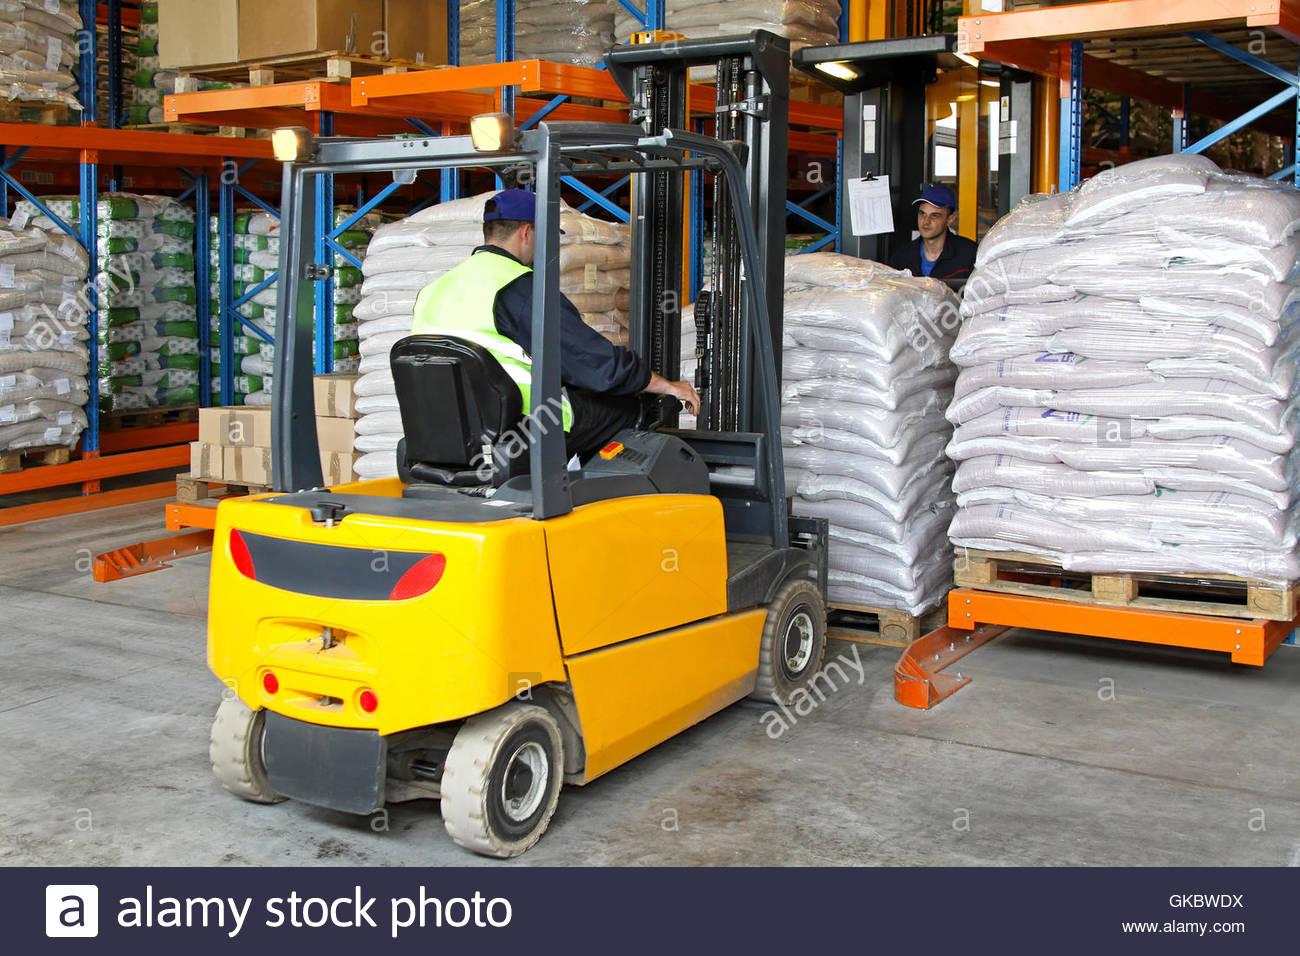 warehouse shelves distribution - Stock Image